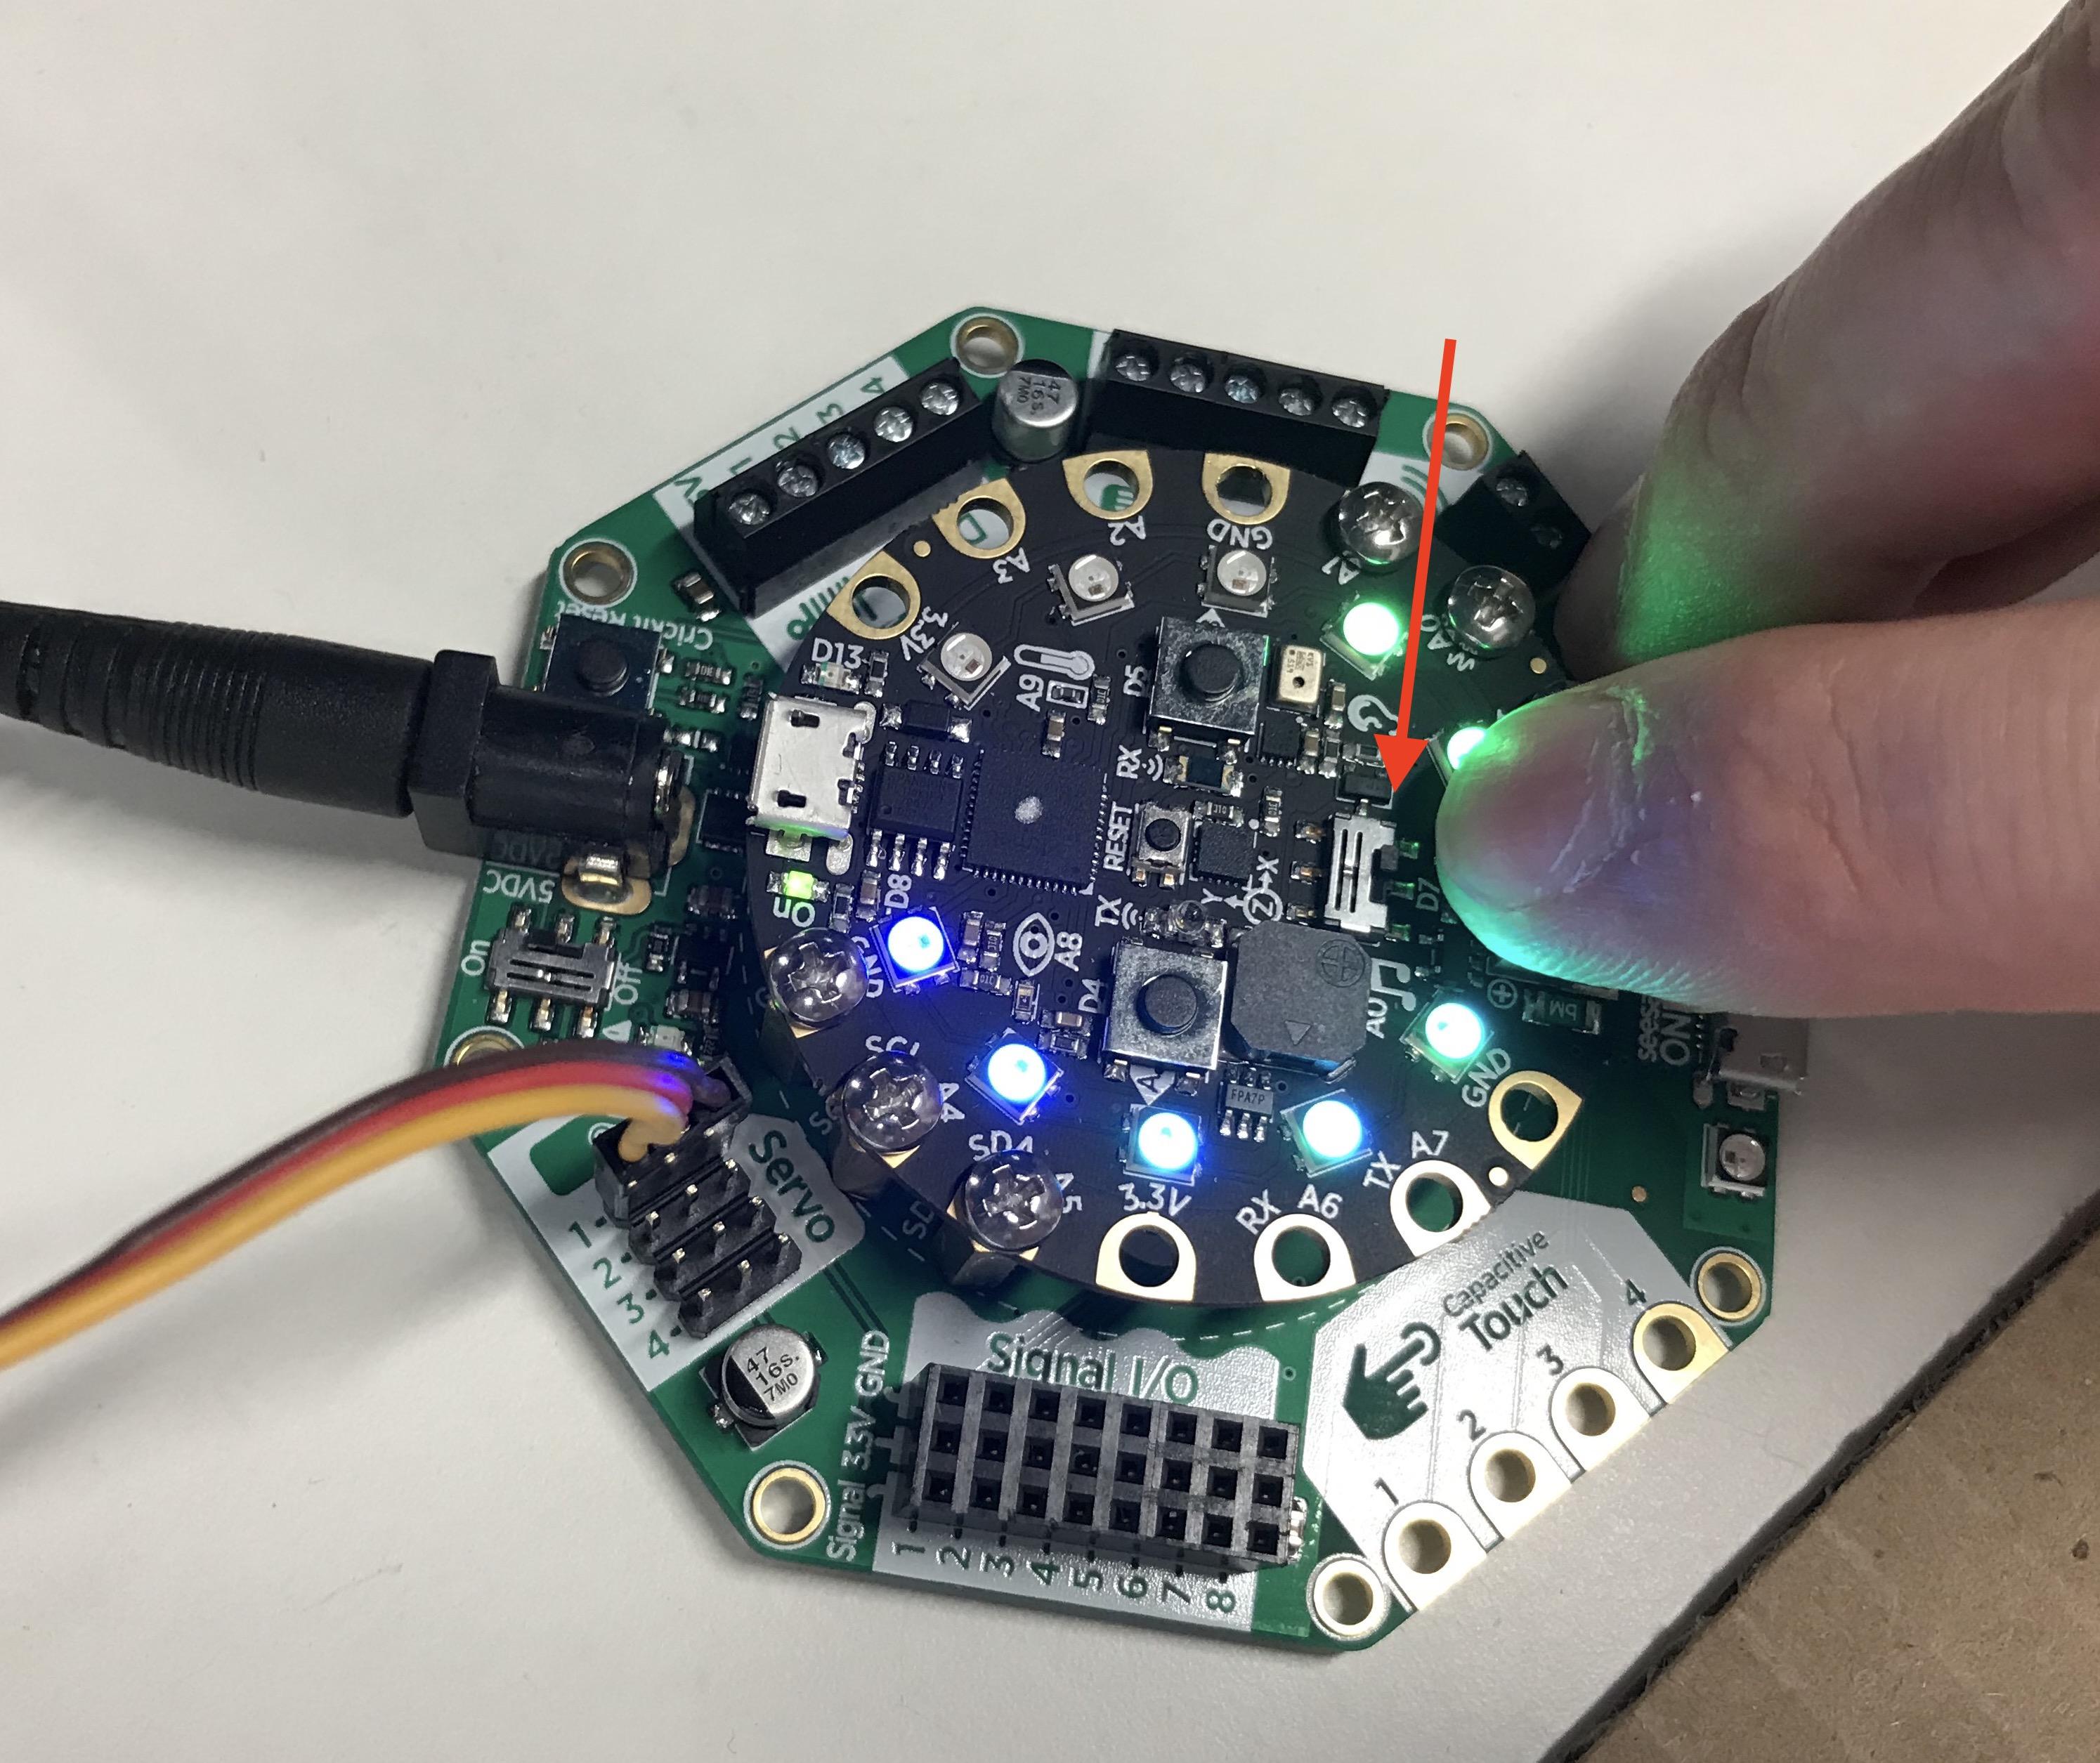 circuitpython_IMG_3439_copy.jpg